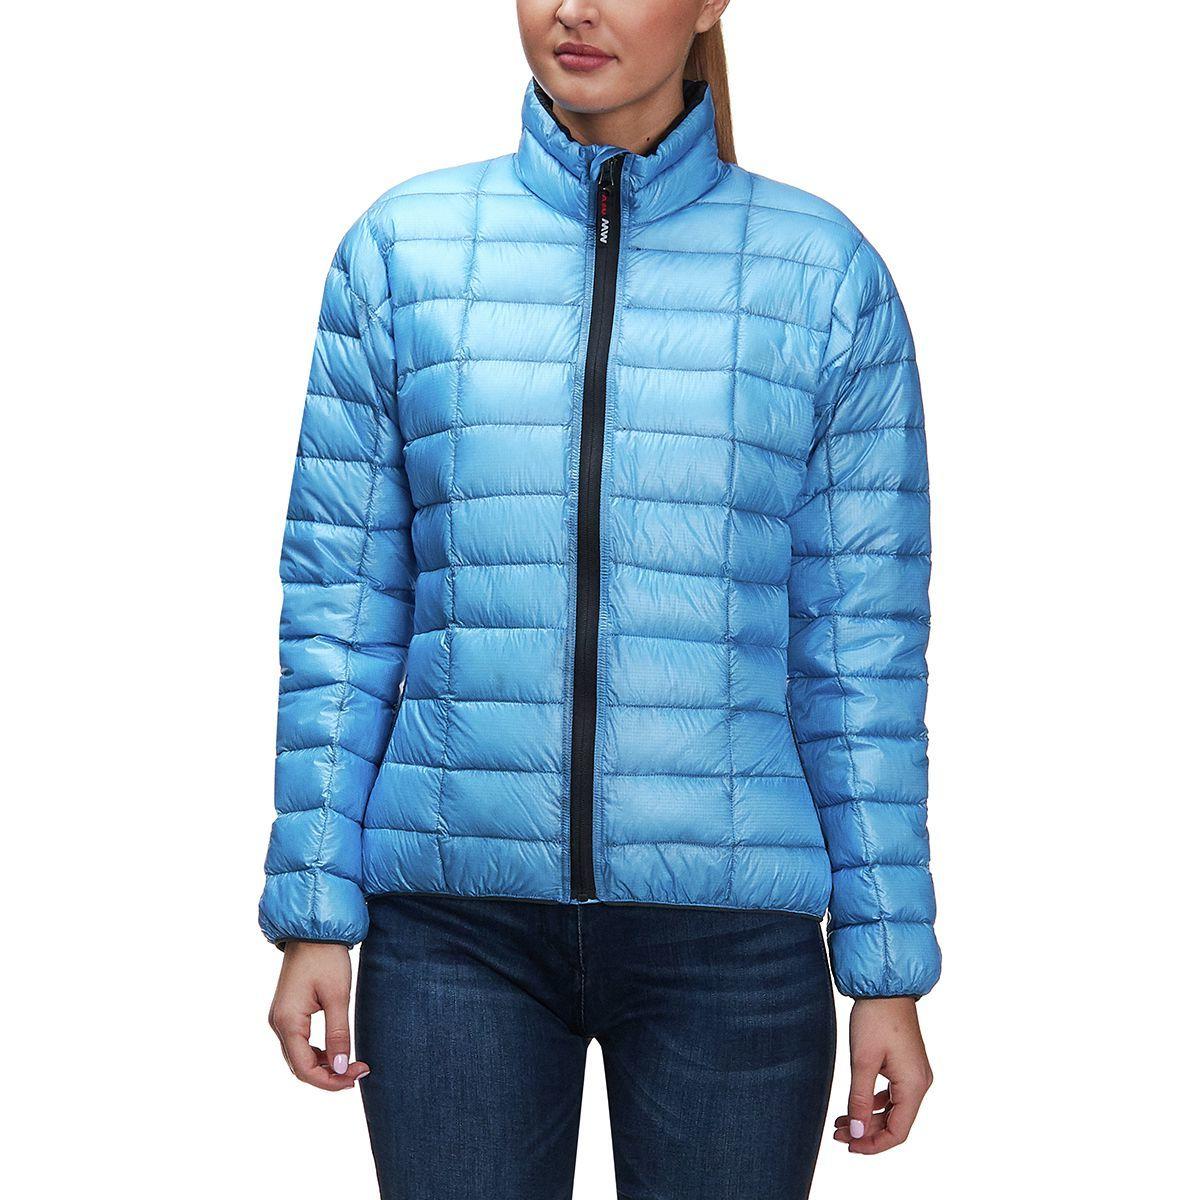 Western Mountaineering Quick Flash Down Jacket - Women's